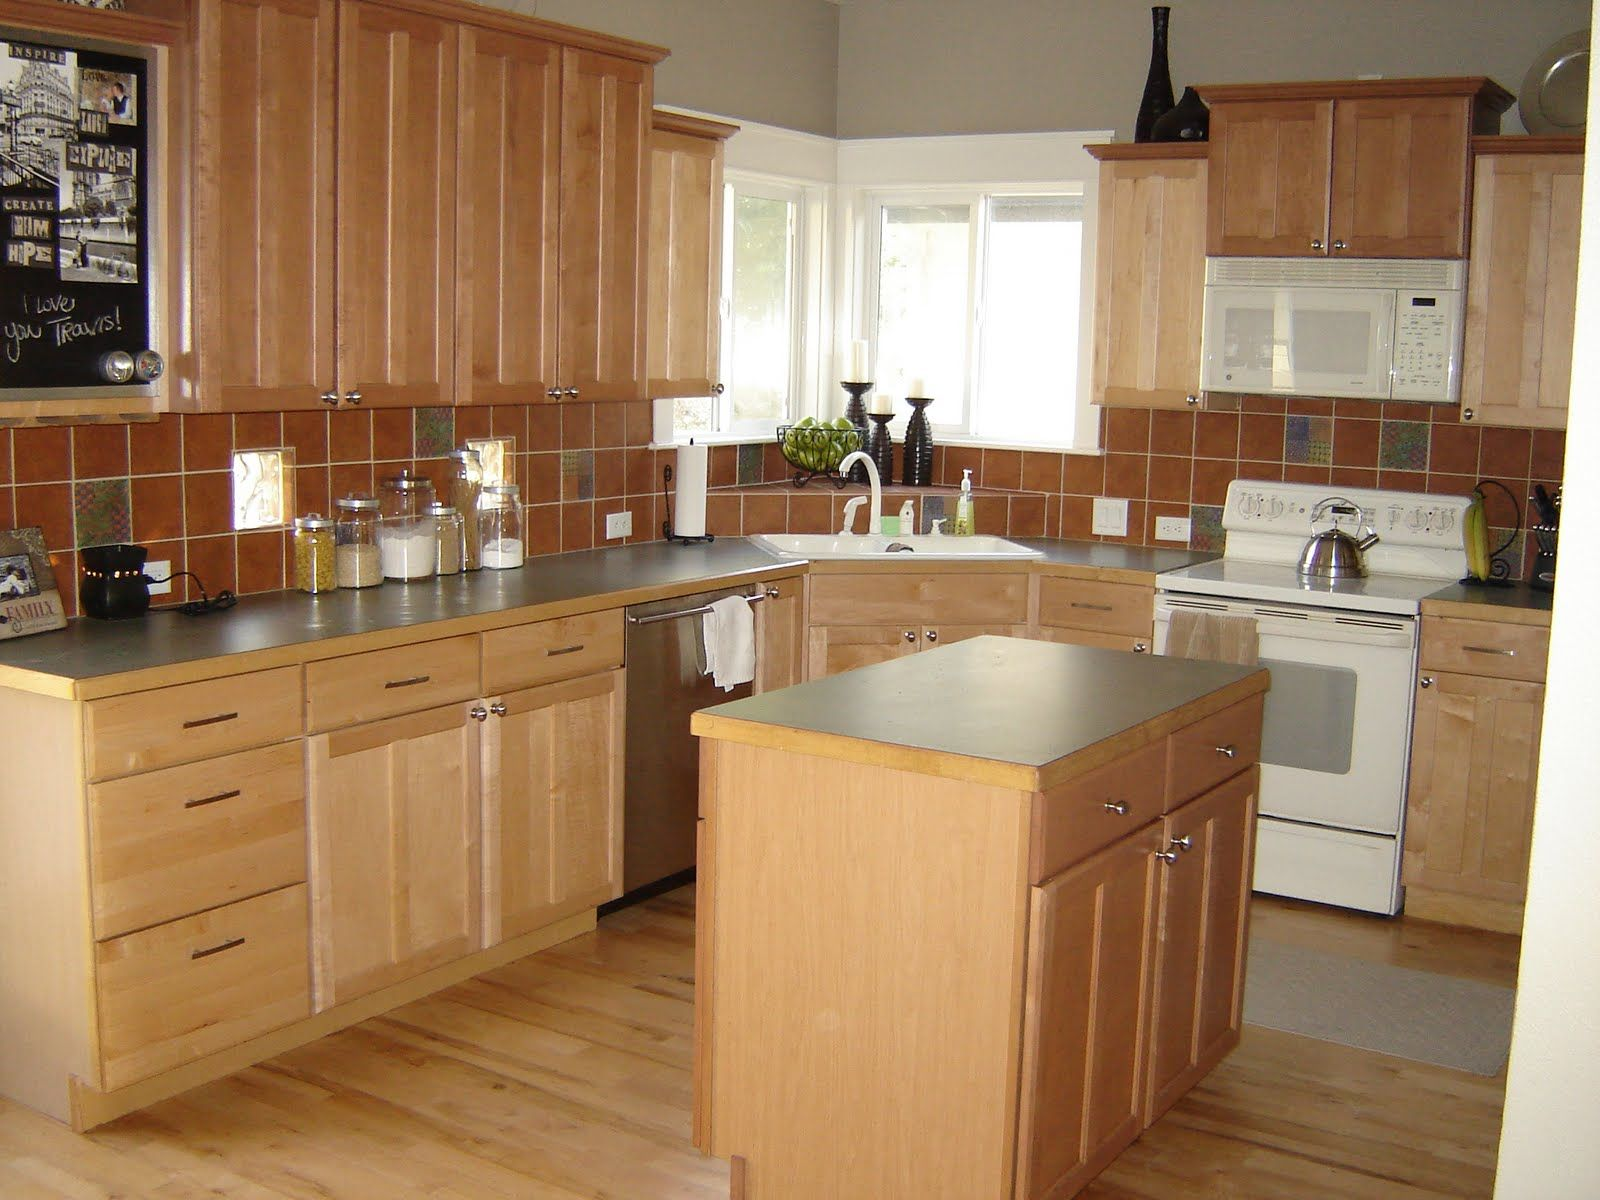 Kitchen Island Countertop Brackets Buy Lafayette Stainless Steel Top